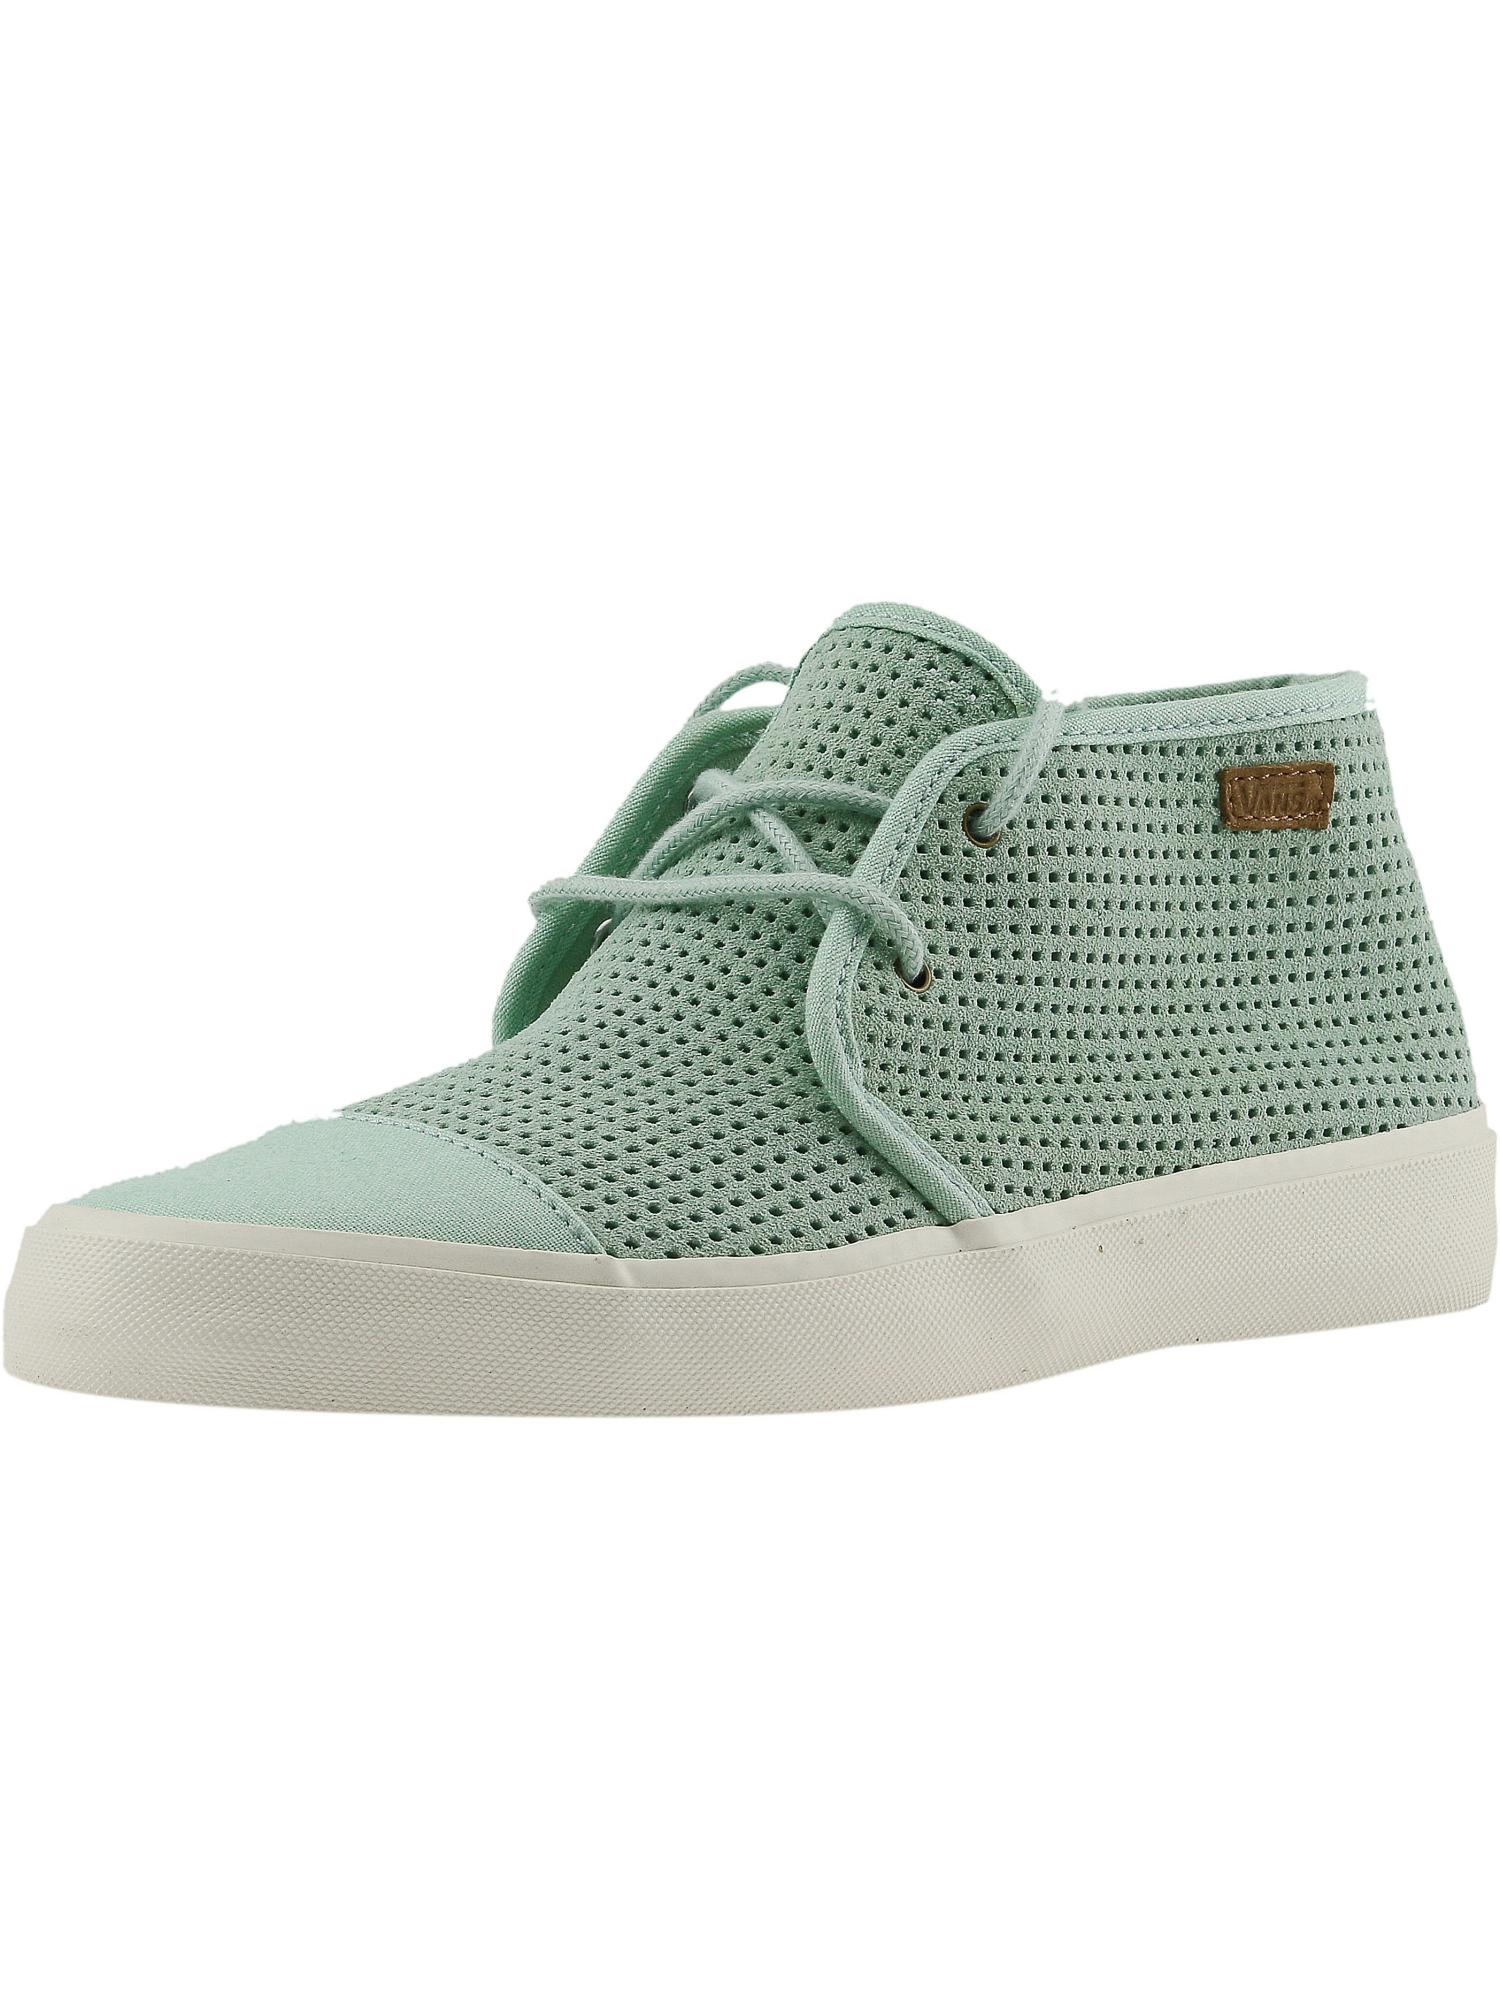 Vans-Women-039-s-Rhea-Square-Perf-Ankle-